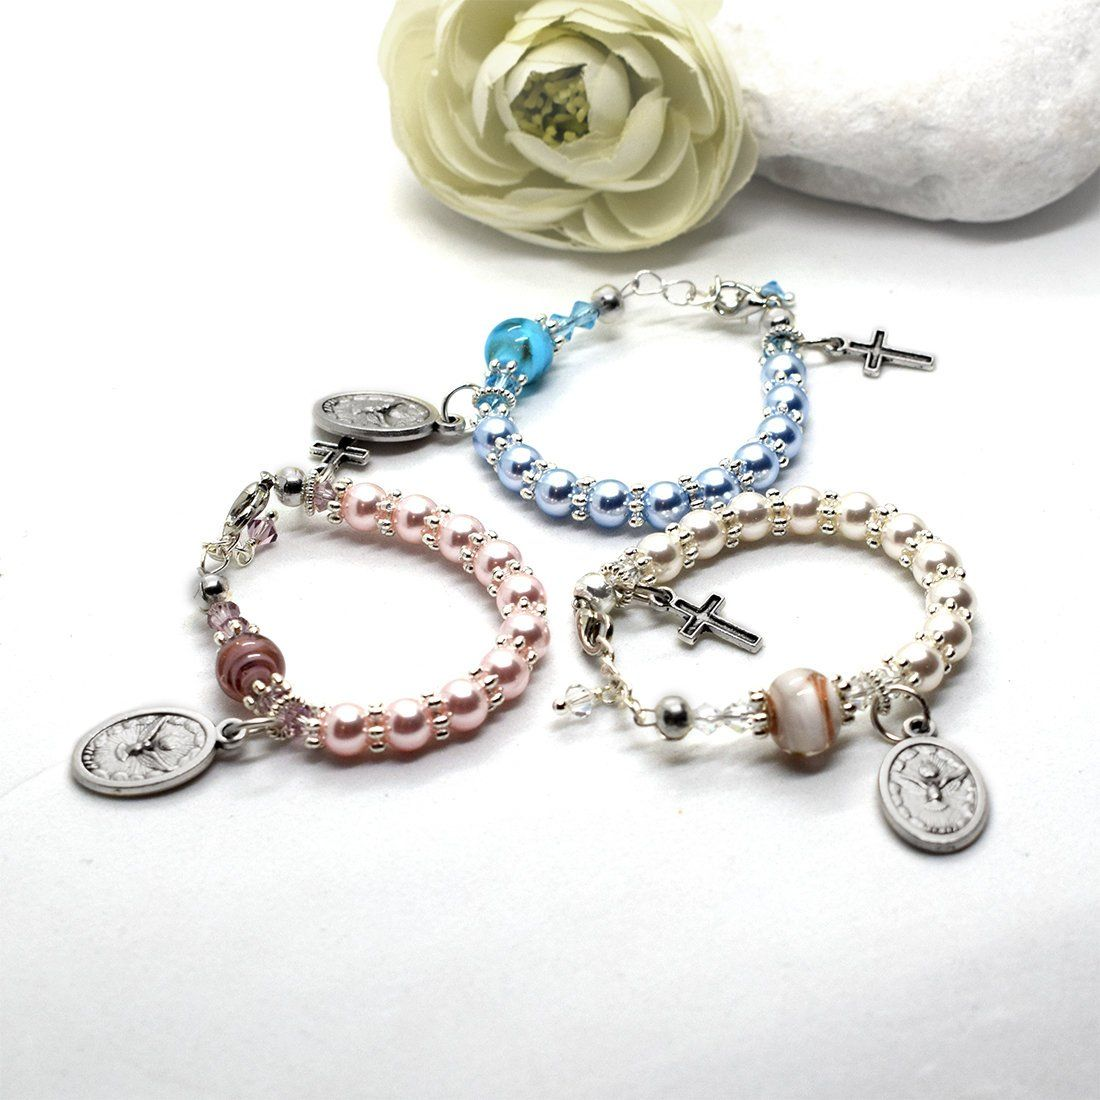 Baptism bracelet, Rosary bracelet, Baby Girl / Baby Boy gift, Swarovski Murano glass bracelet, Christening gift, Baptism gift, Catholic gift